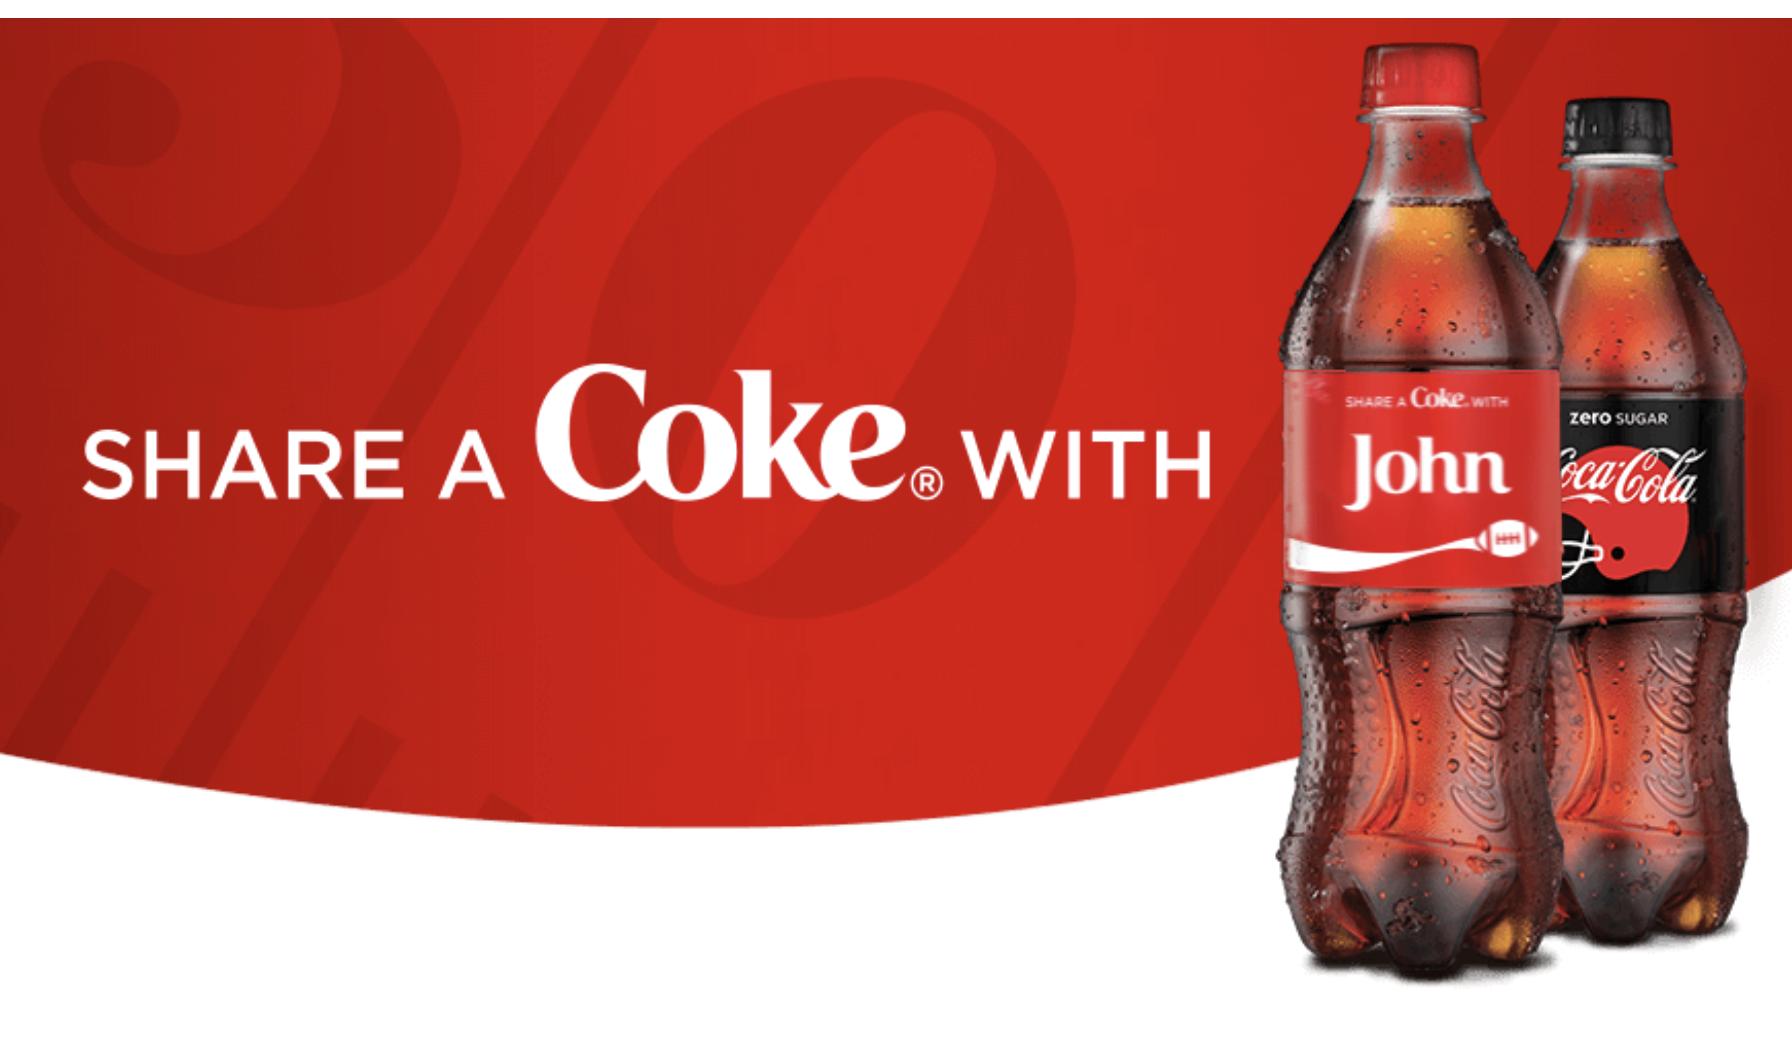 【KO】連続増配年数56年を誇る配当王『コカコーラ』の今後の株価を予想する!往年のウォーレン・バフェット銘柄を紐解く。